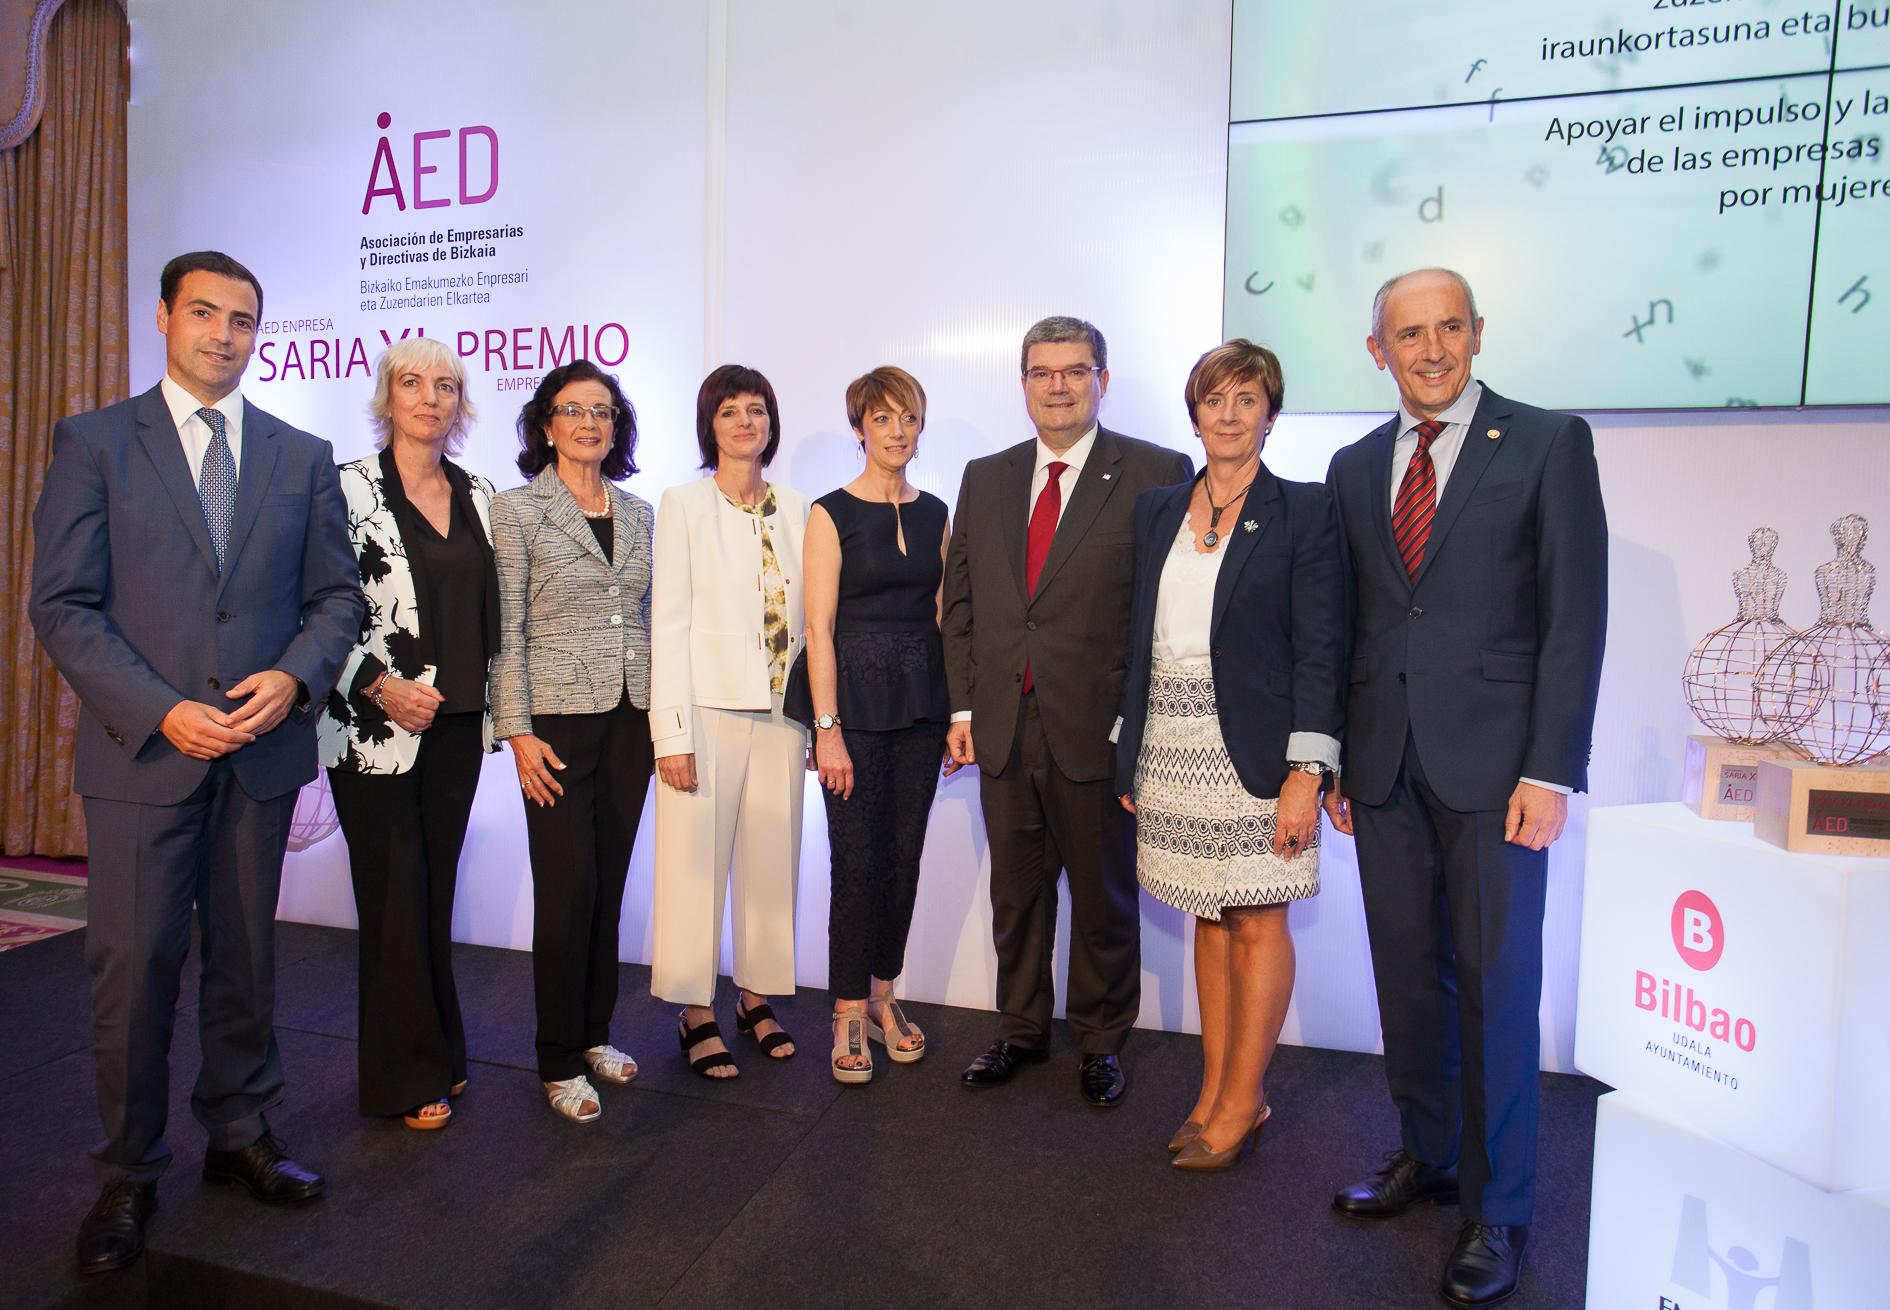 2017-06-15_premios_AED-17.jpg